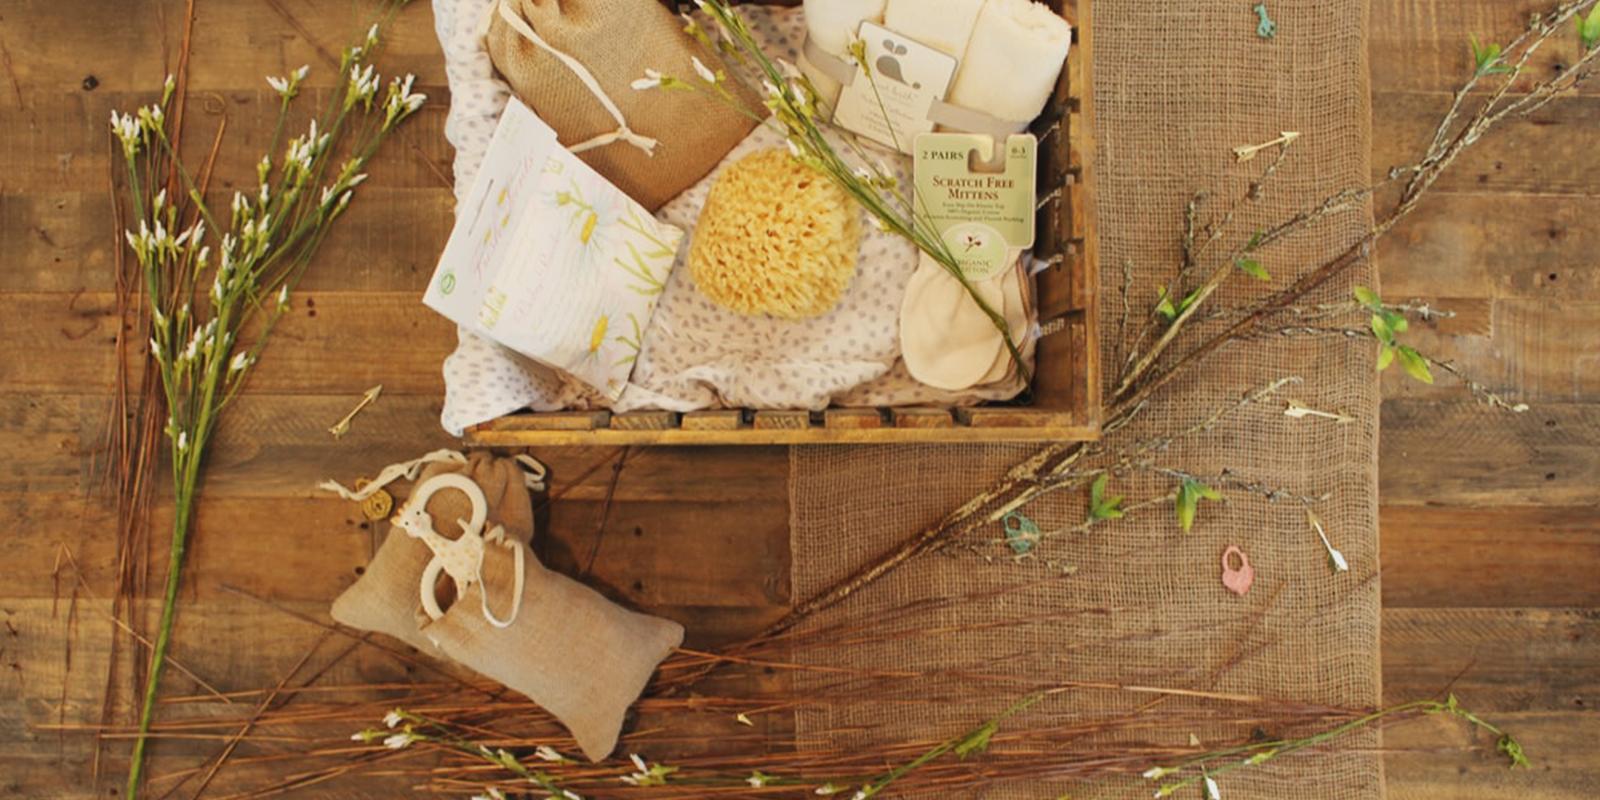 Voňavé dárky v podobě mýdel